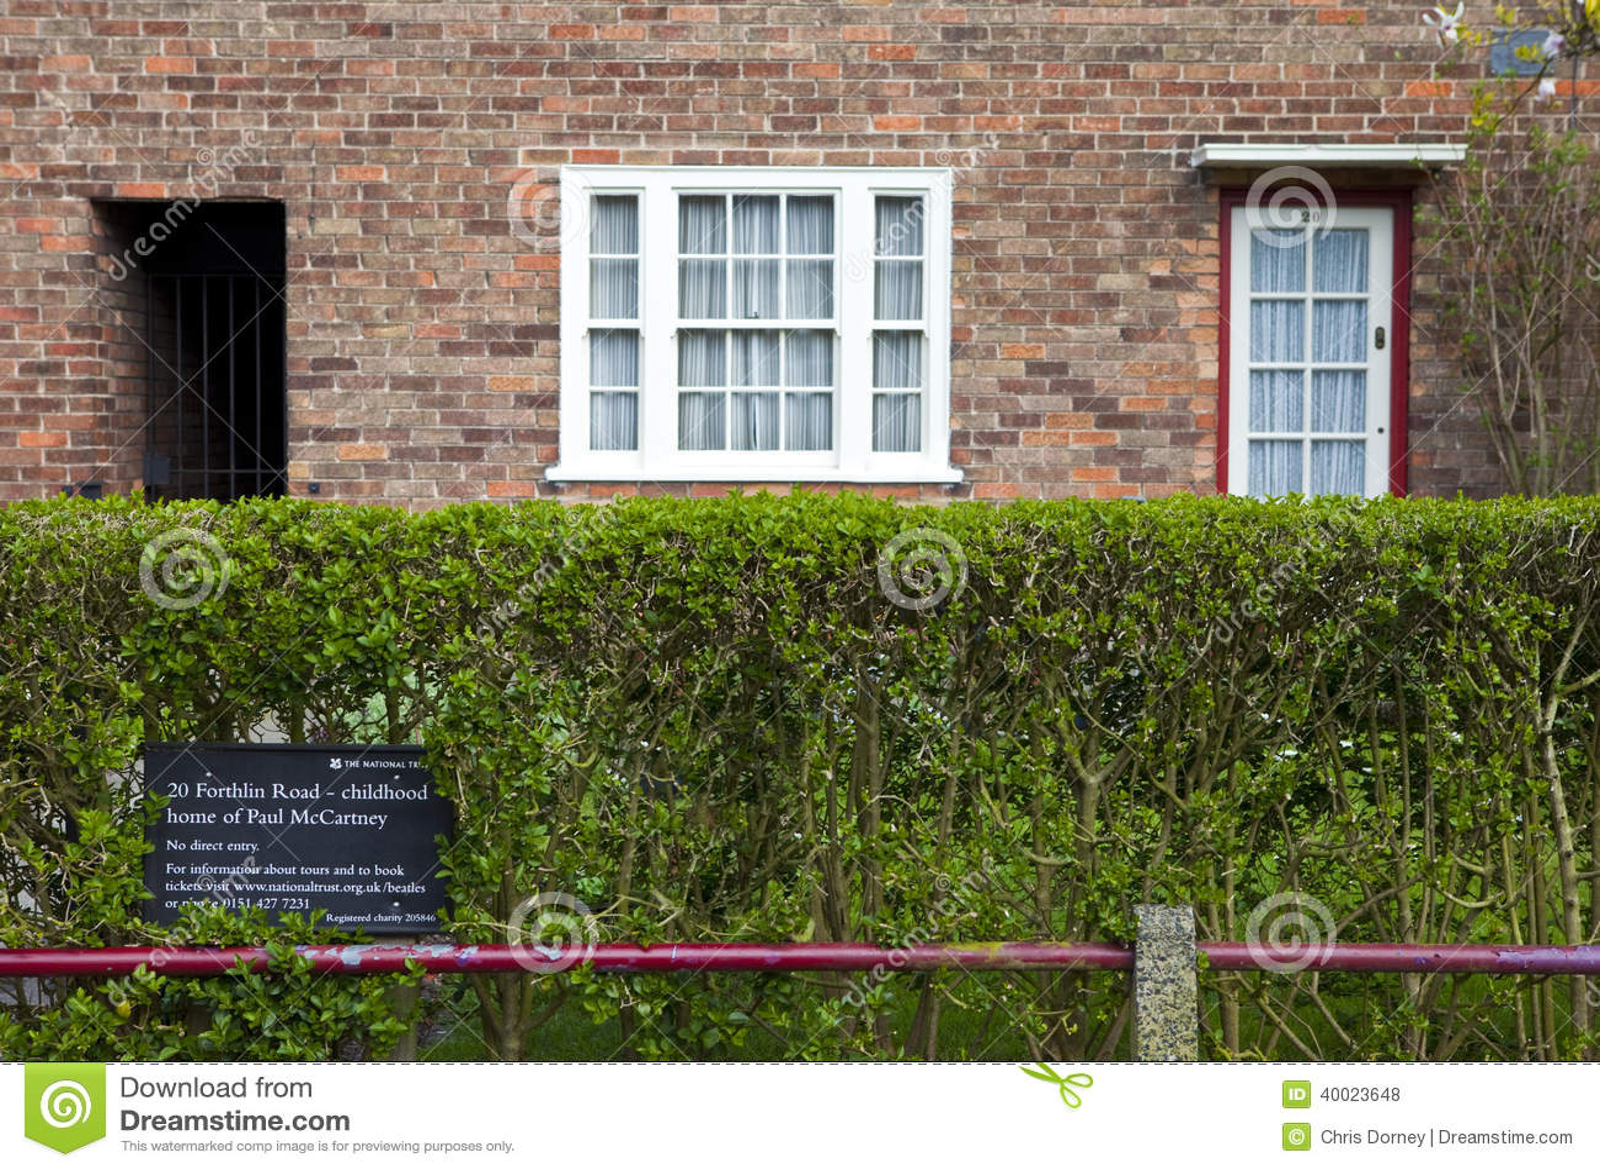 maison d 39 enfance de sir paul mccartney liverpool photo stock ditorial image 40023648. Black Bedroom Furniture Sets. Home Design Ideas